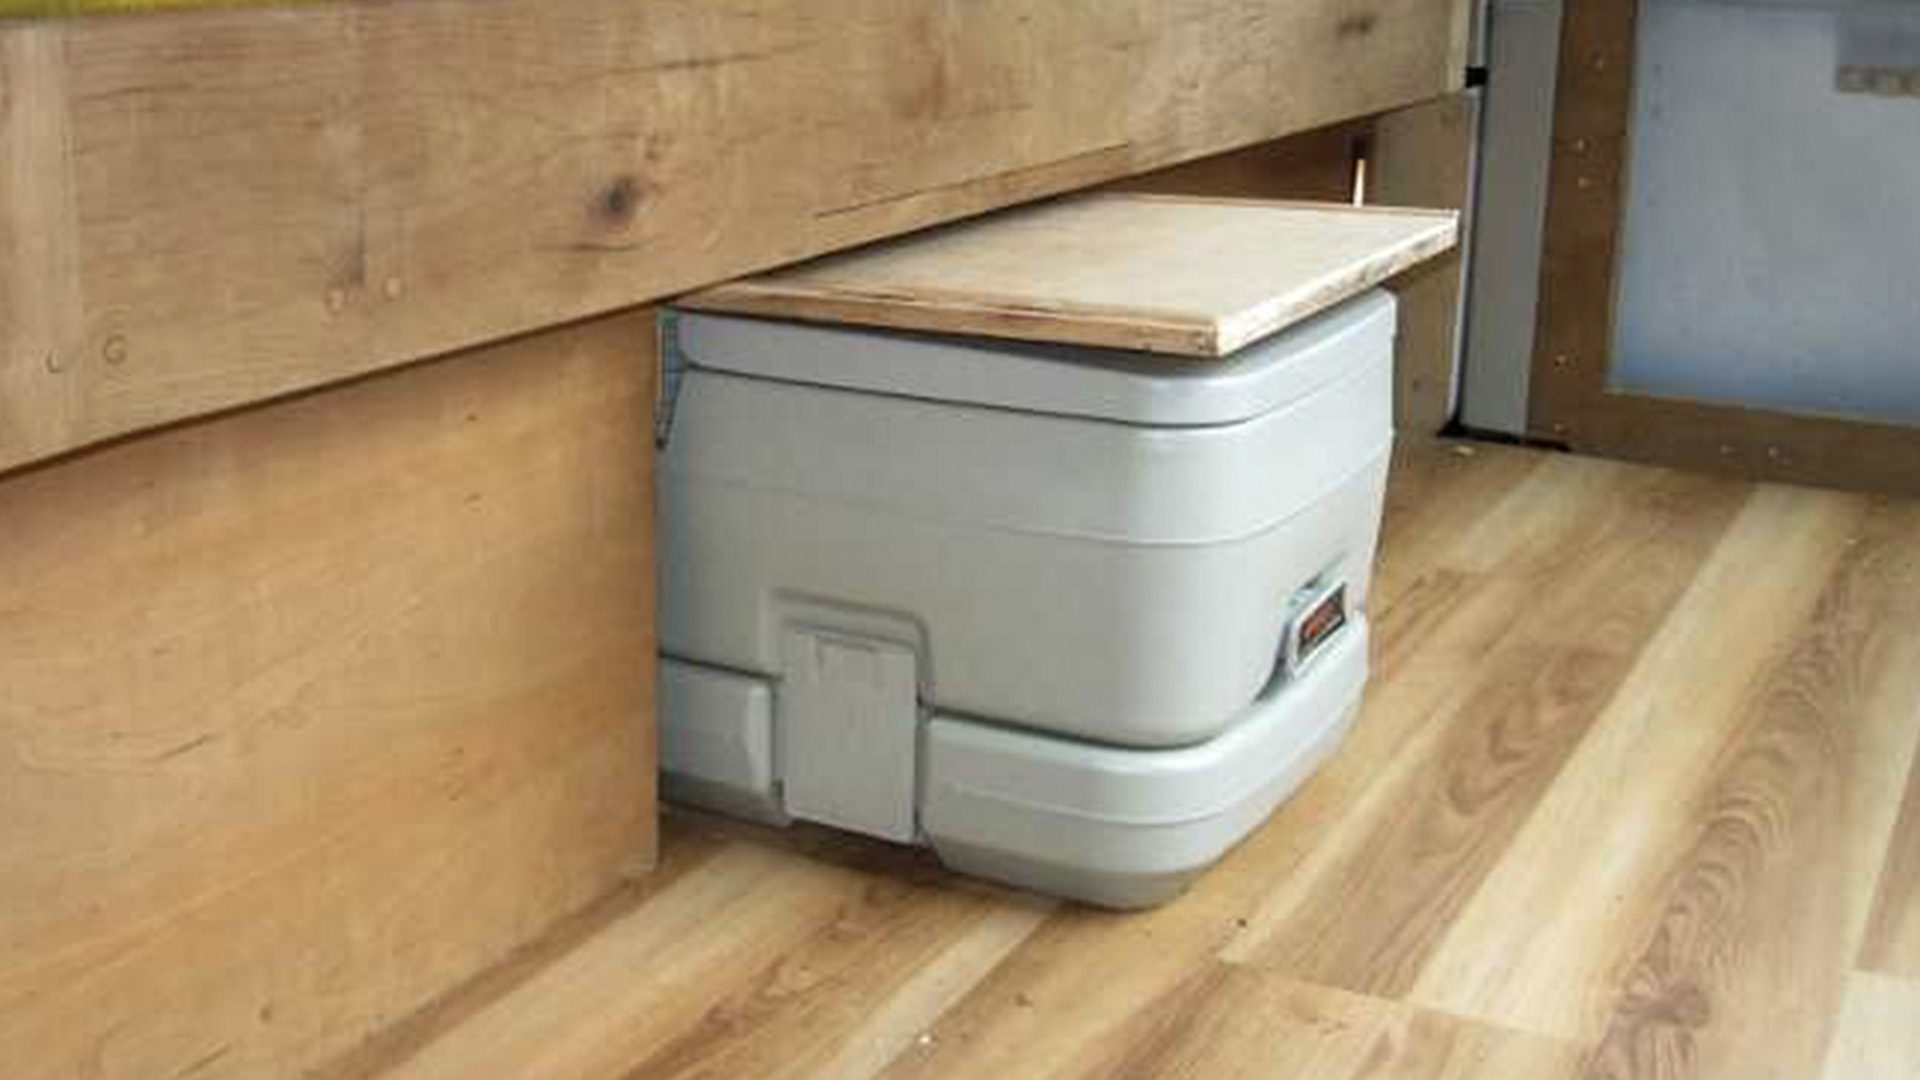 Thetford Porta Potti Qube 365 portable festival boating camping toilet ***NEW***